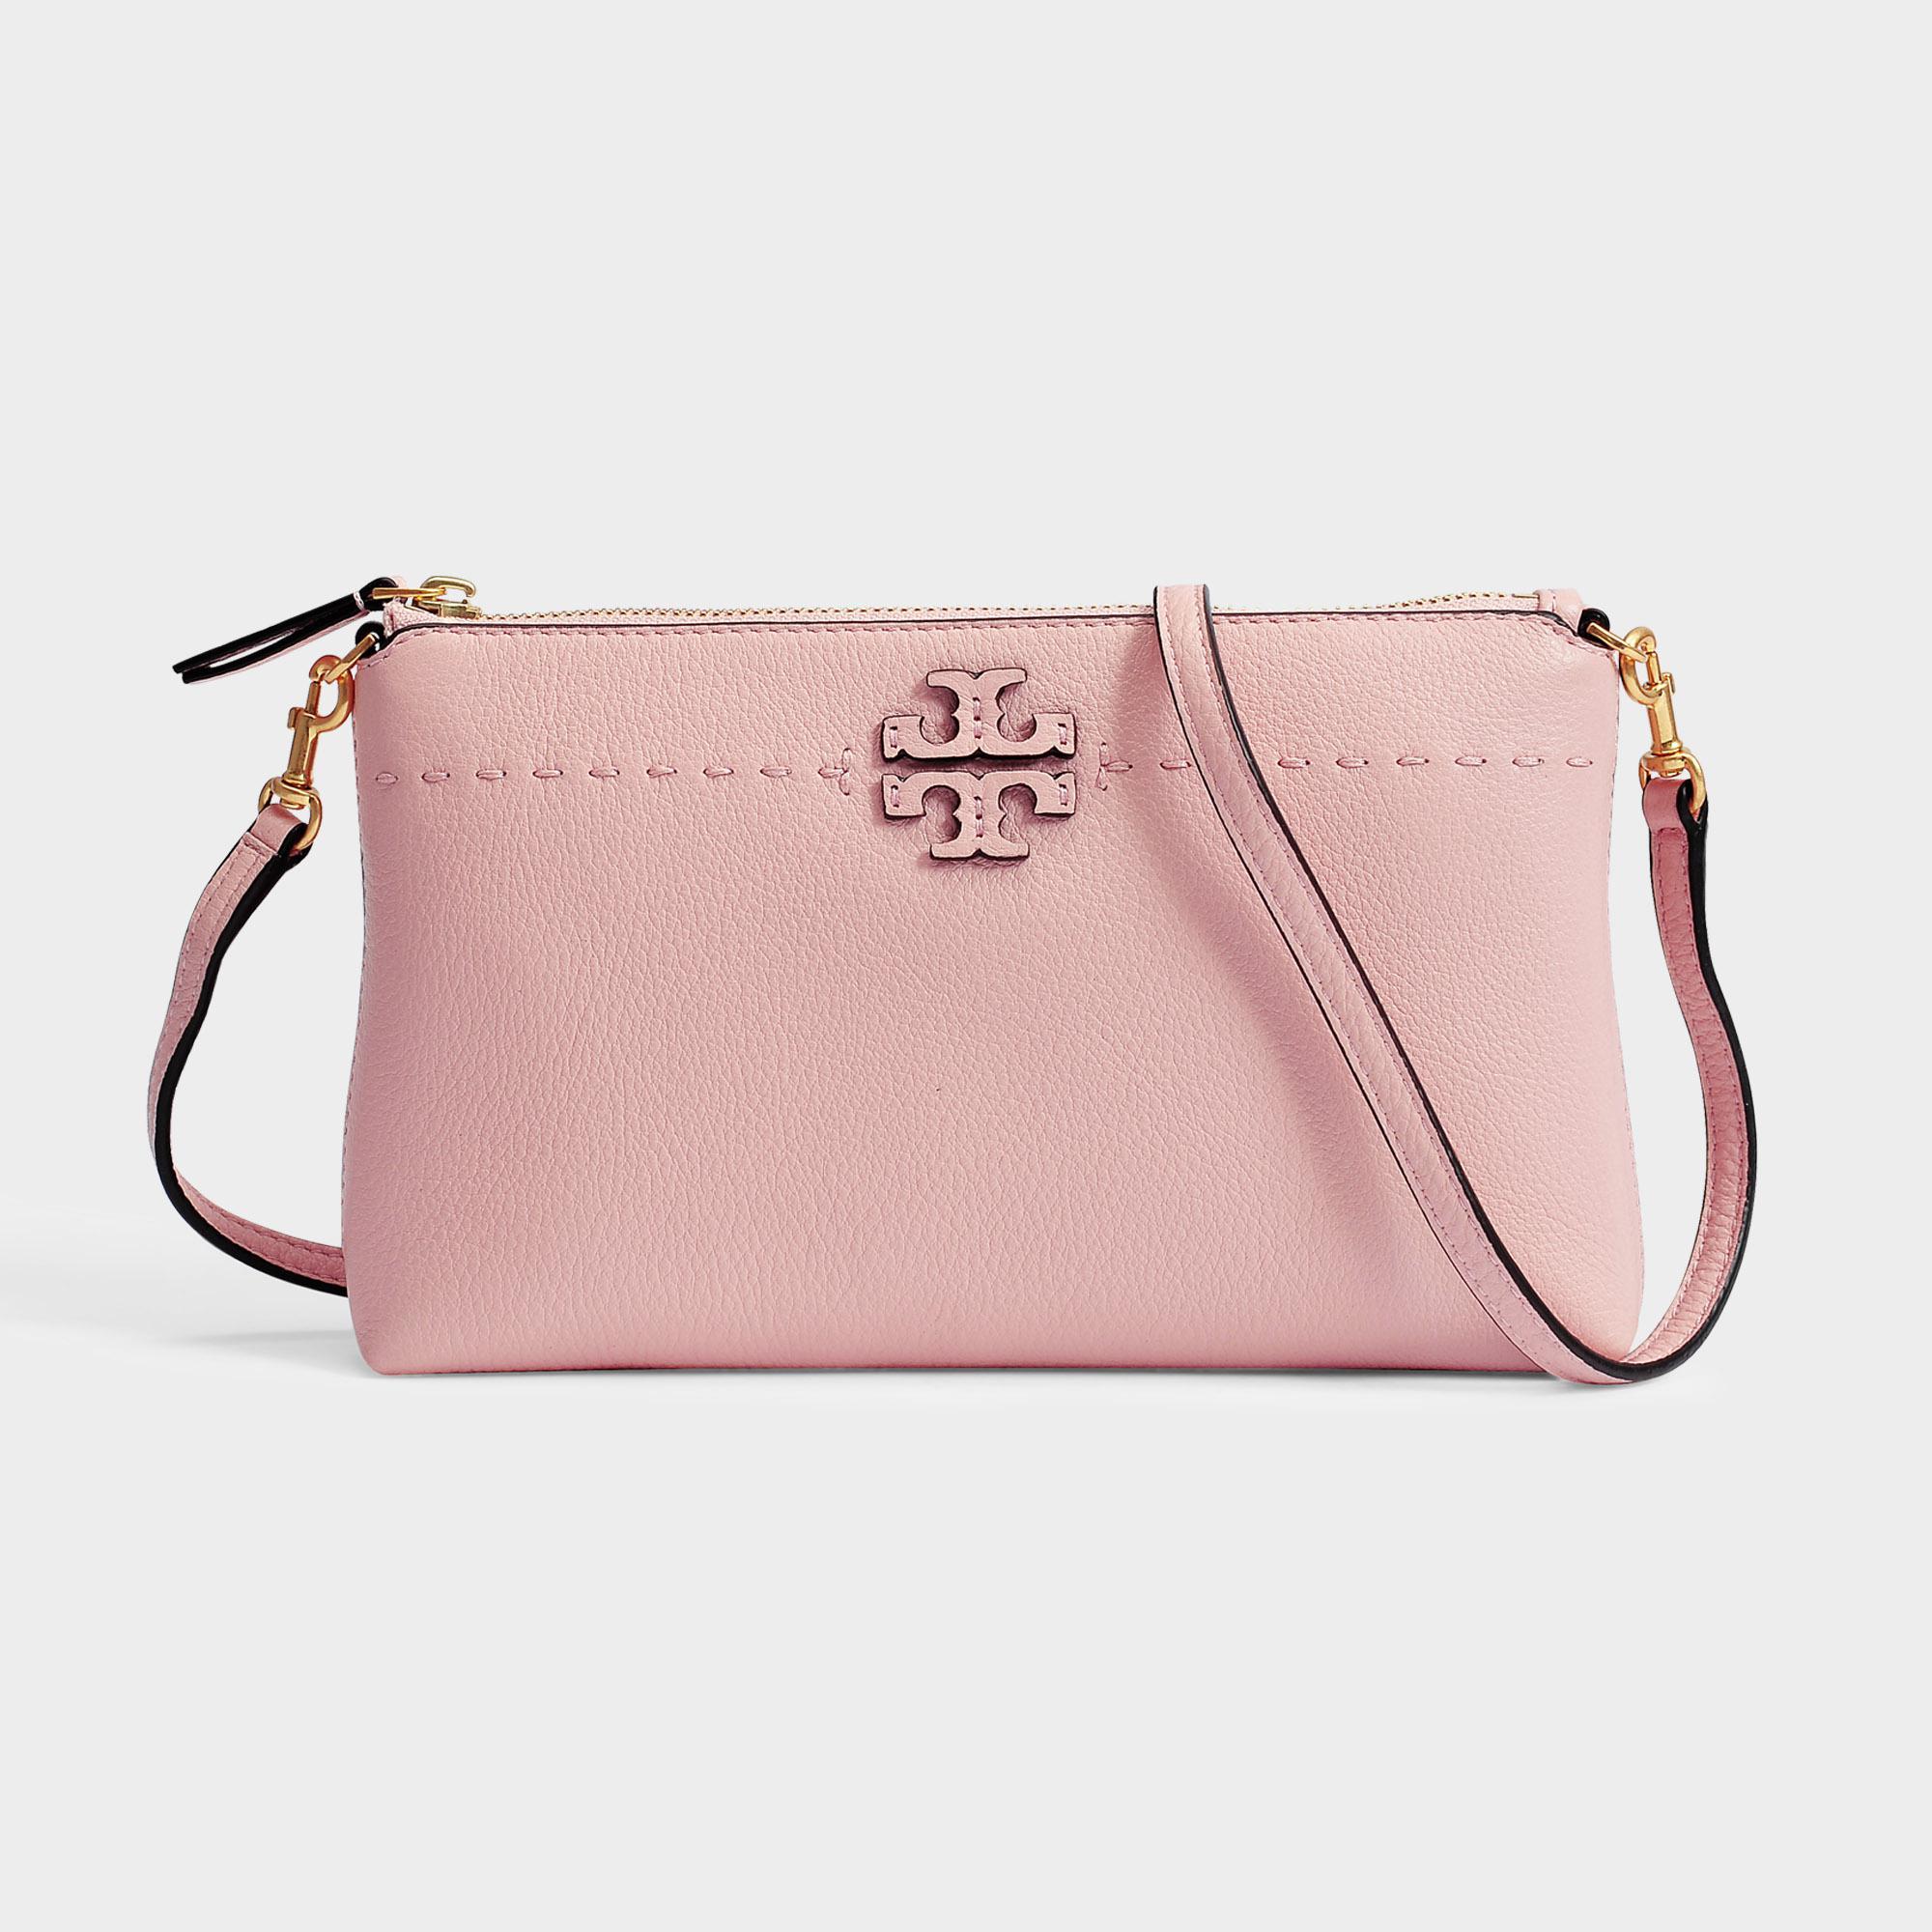 2696be8458 Tory Burch Mcgraw Top Zip Crossbody Bag in Pink - Lyst